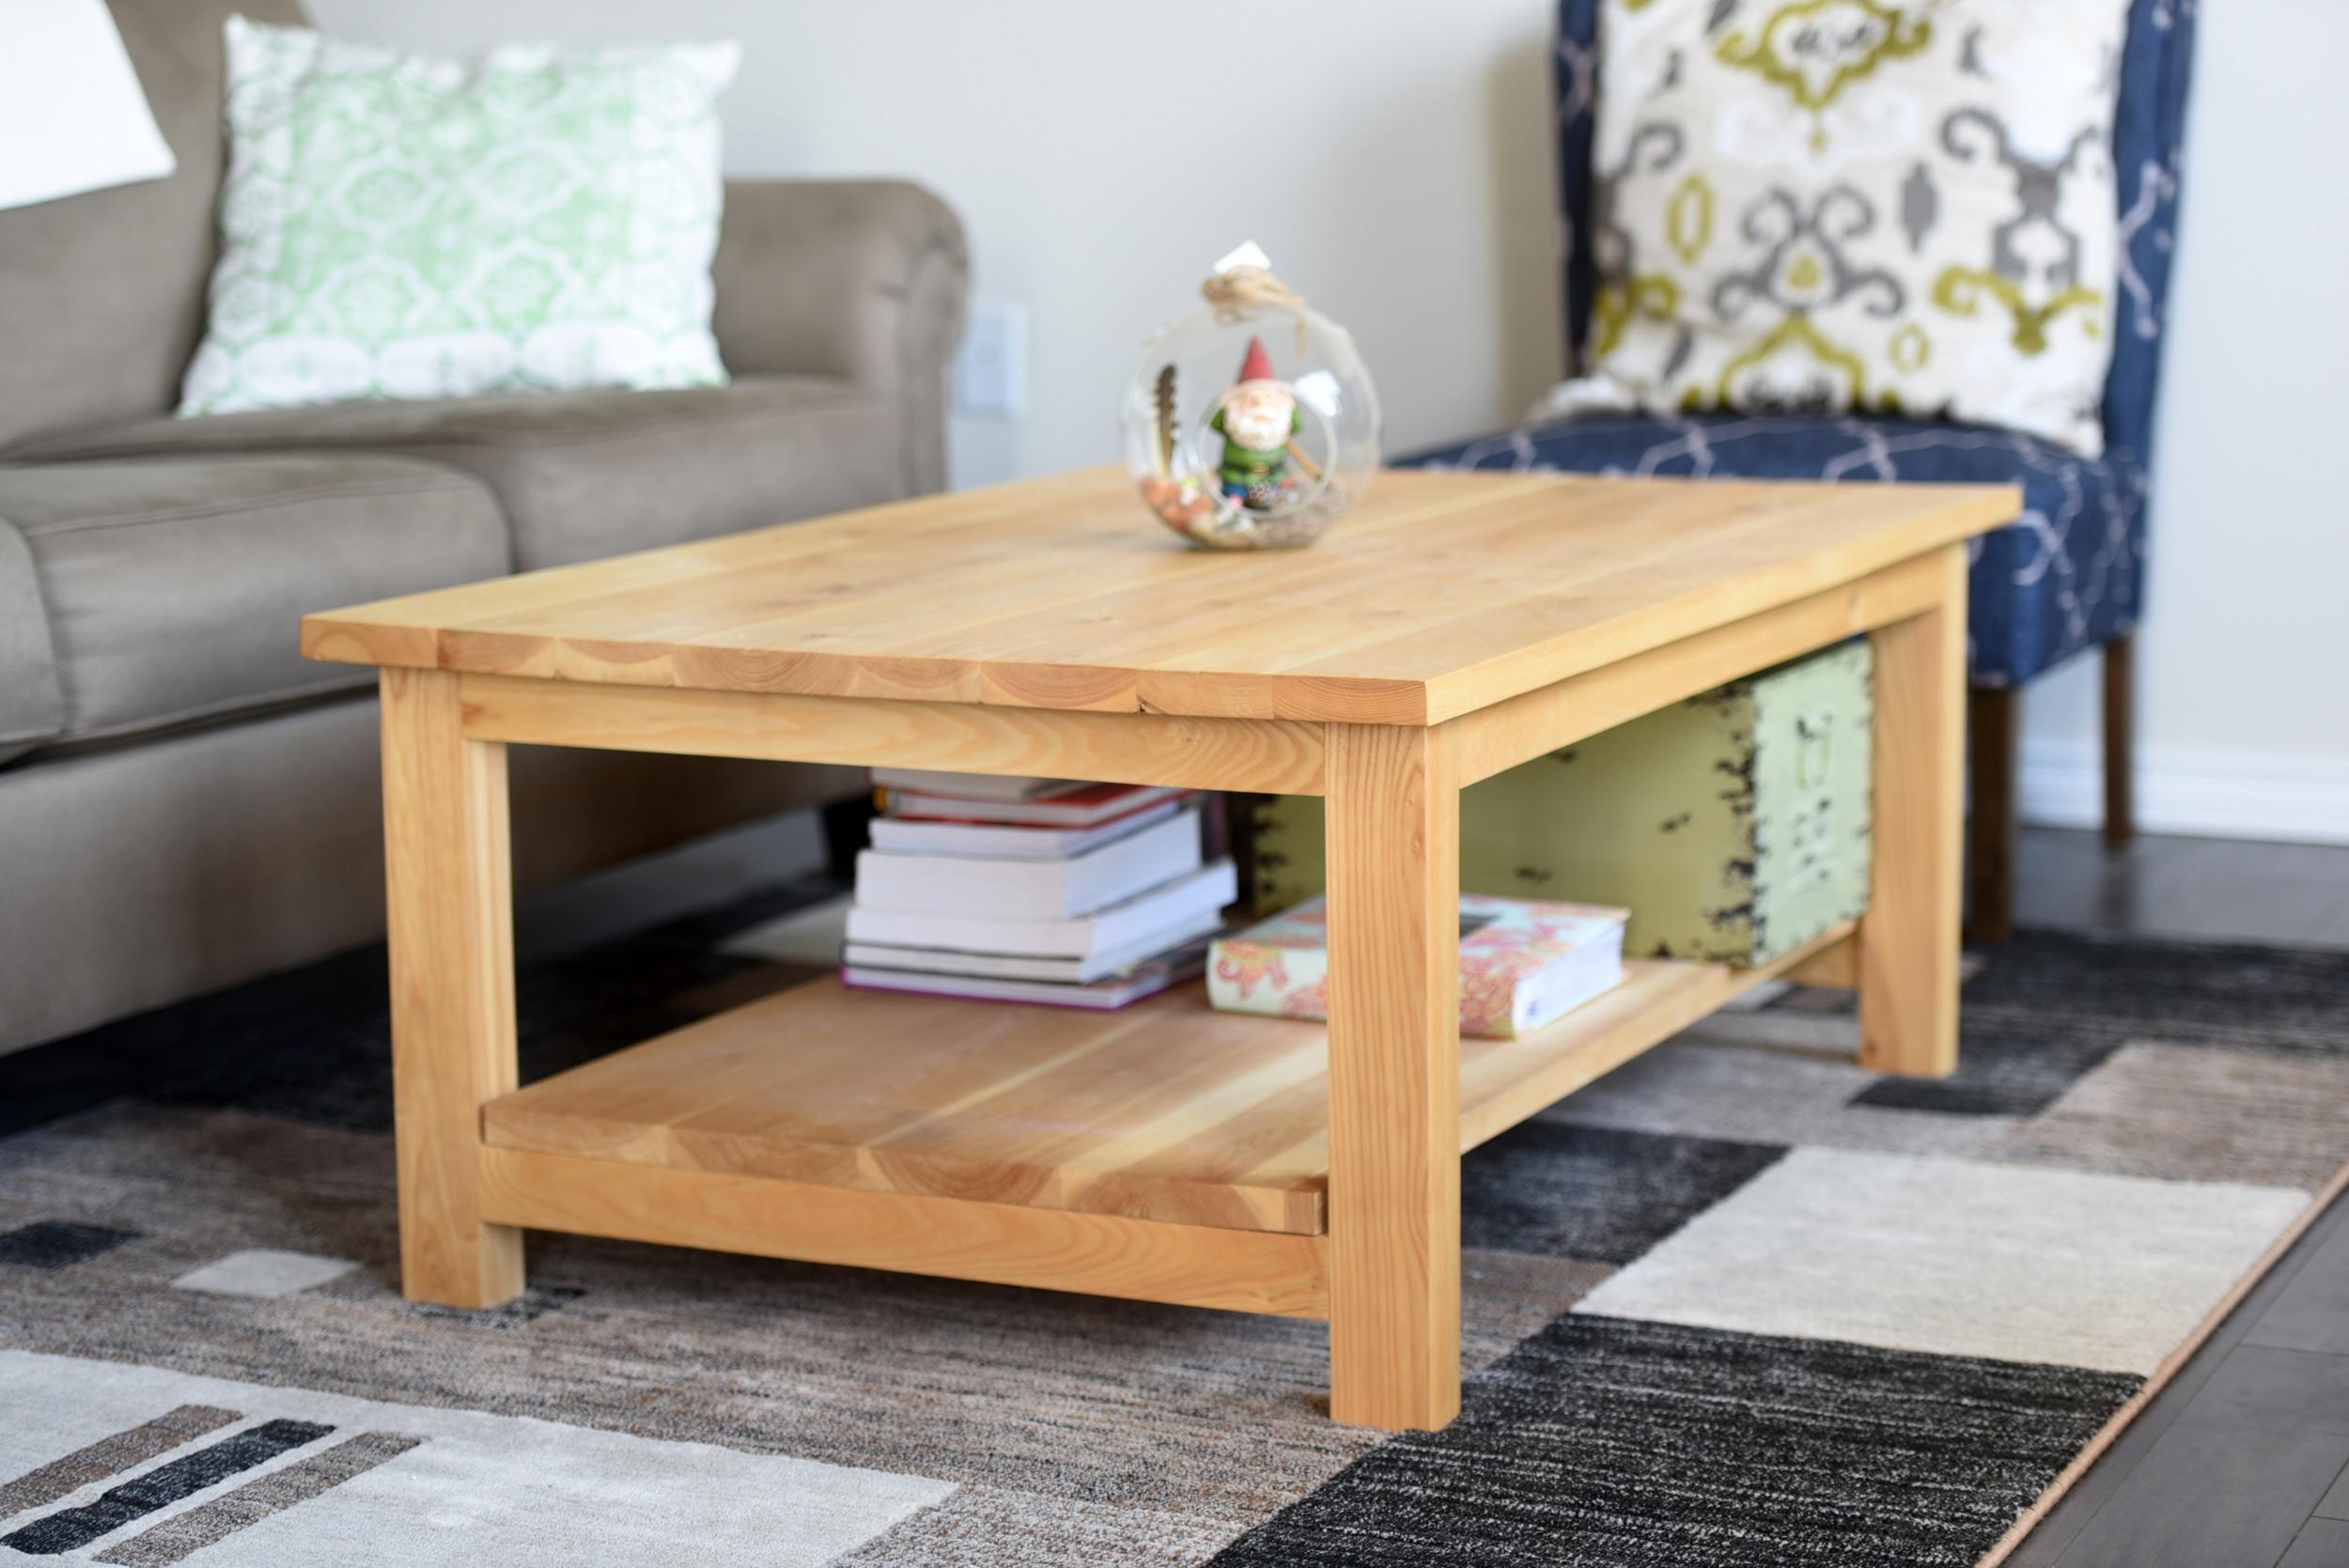 mortise-and-tenon-ash-coffee-table.jpg